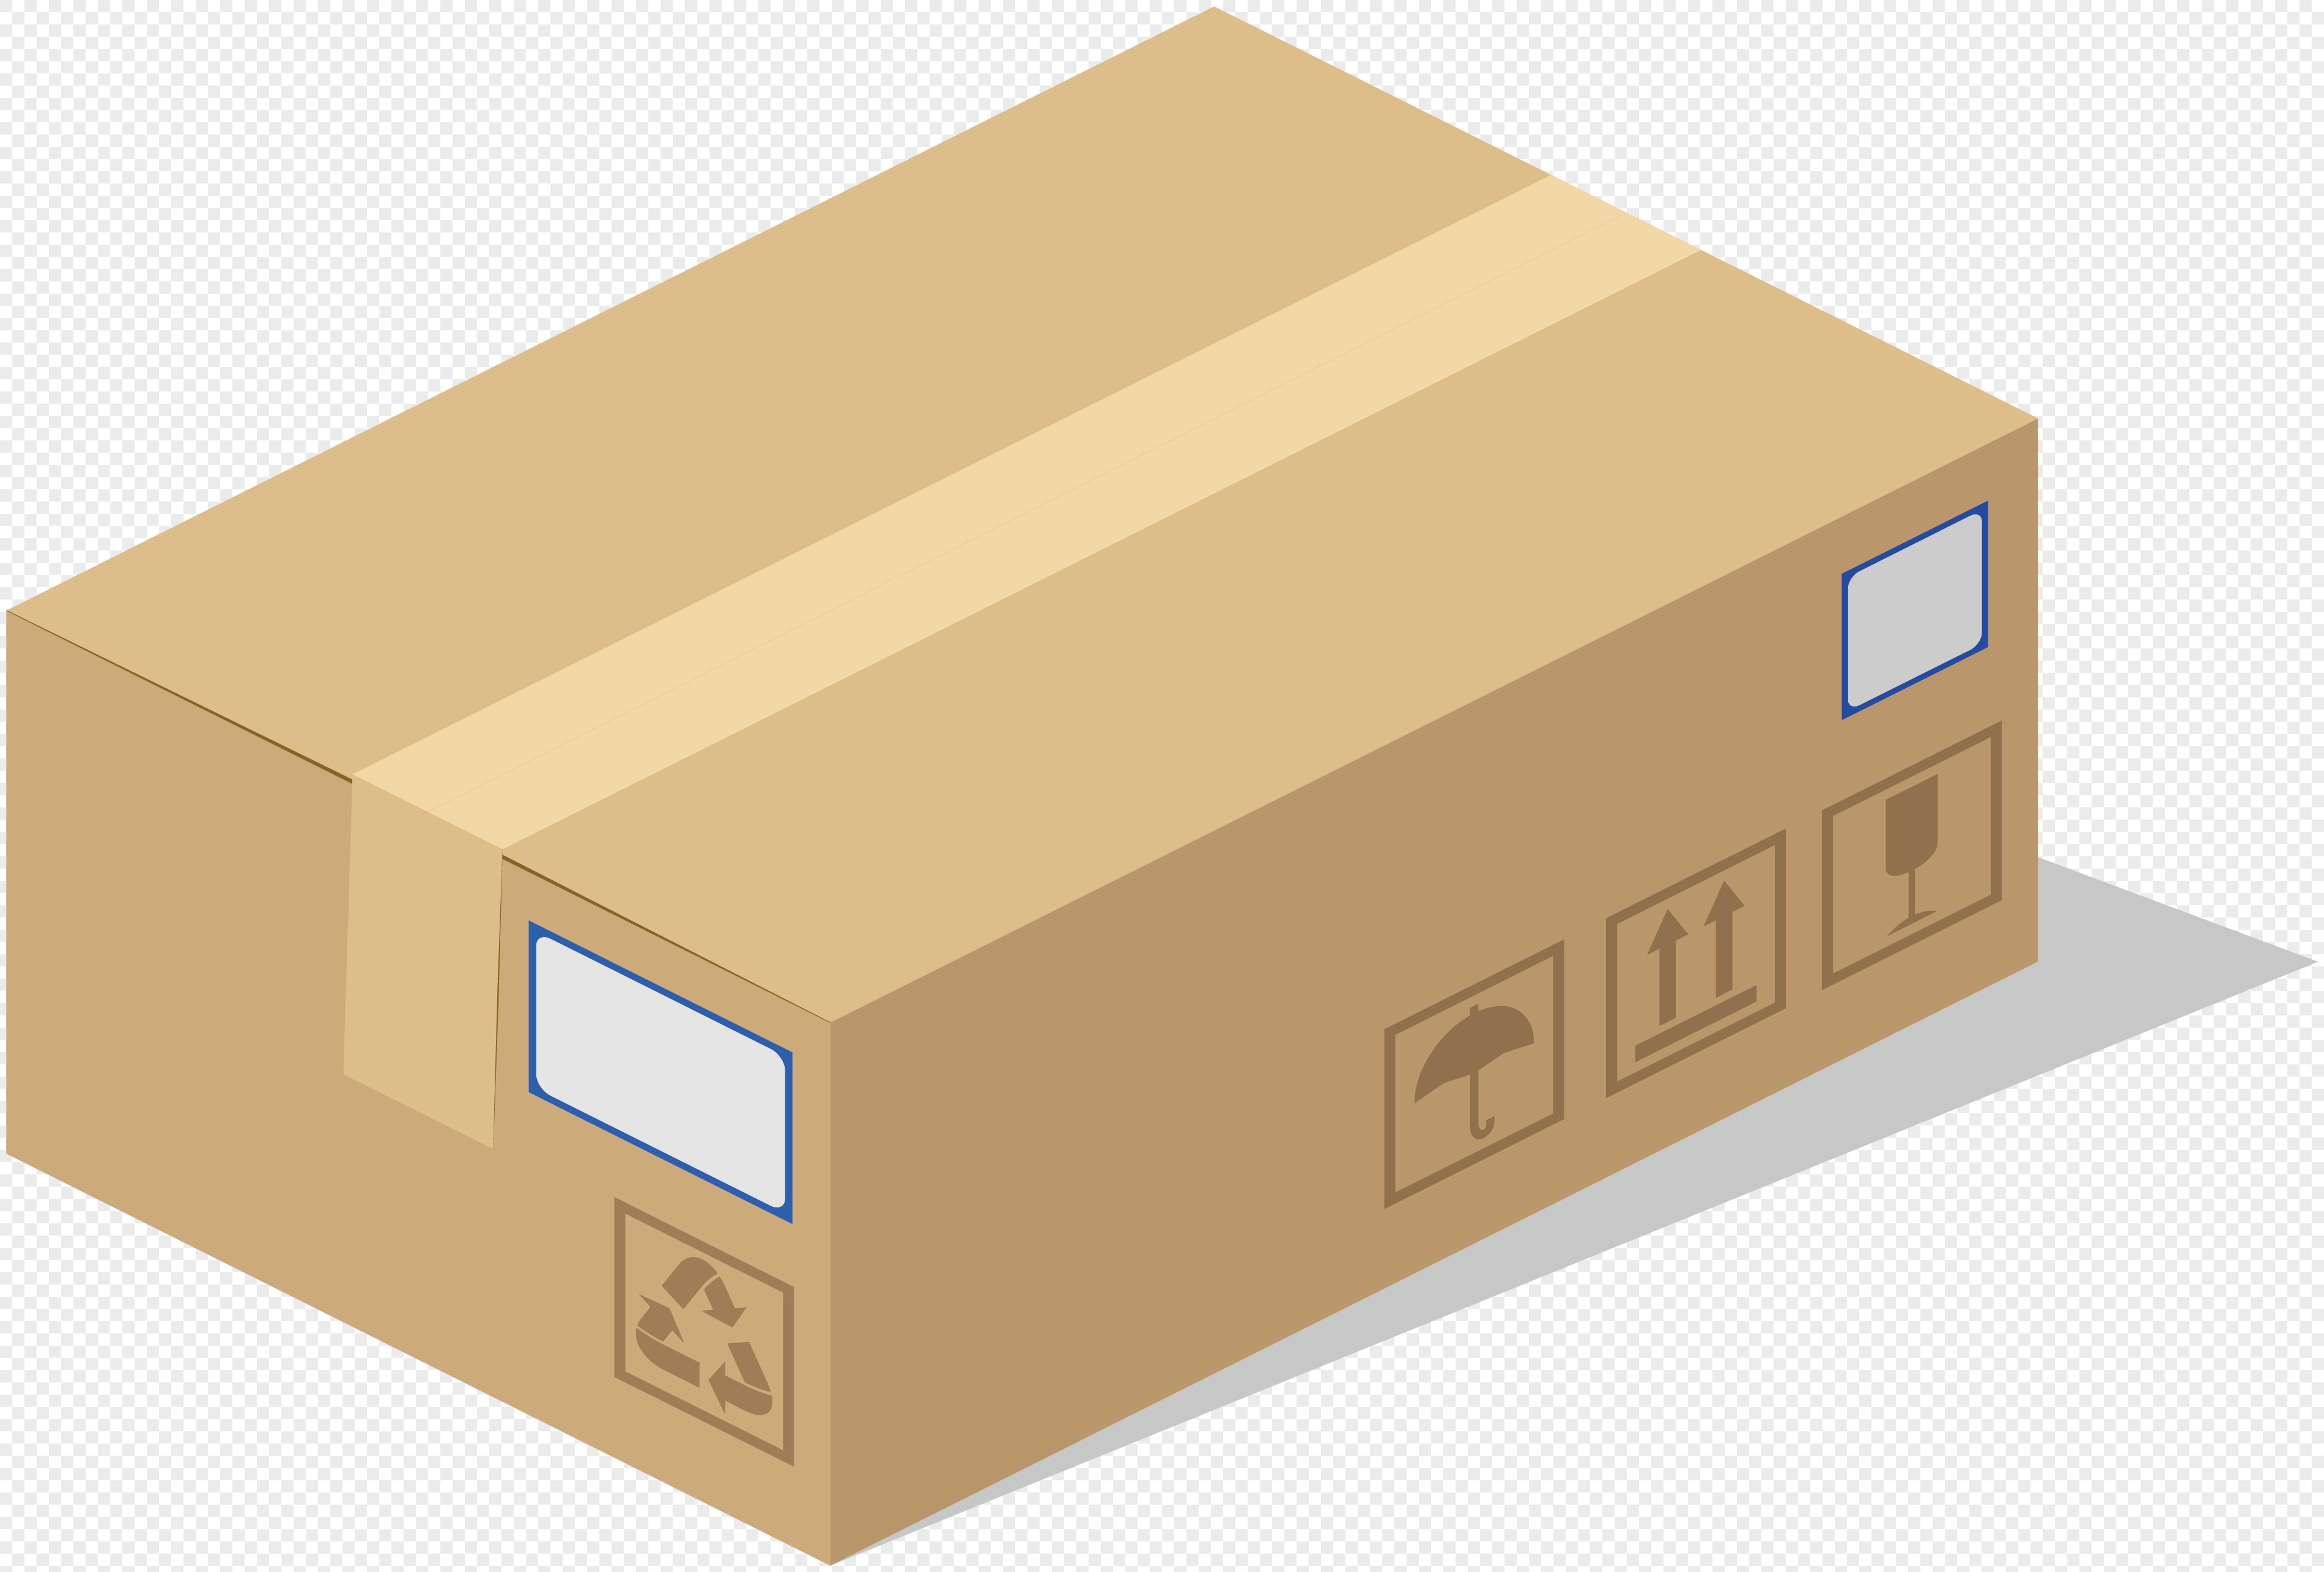 Carton Design Vector Cardboard Corrugated Packaging Box